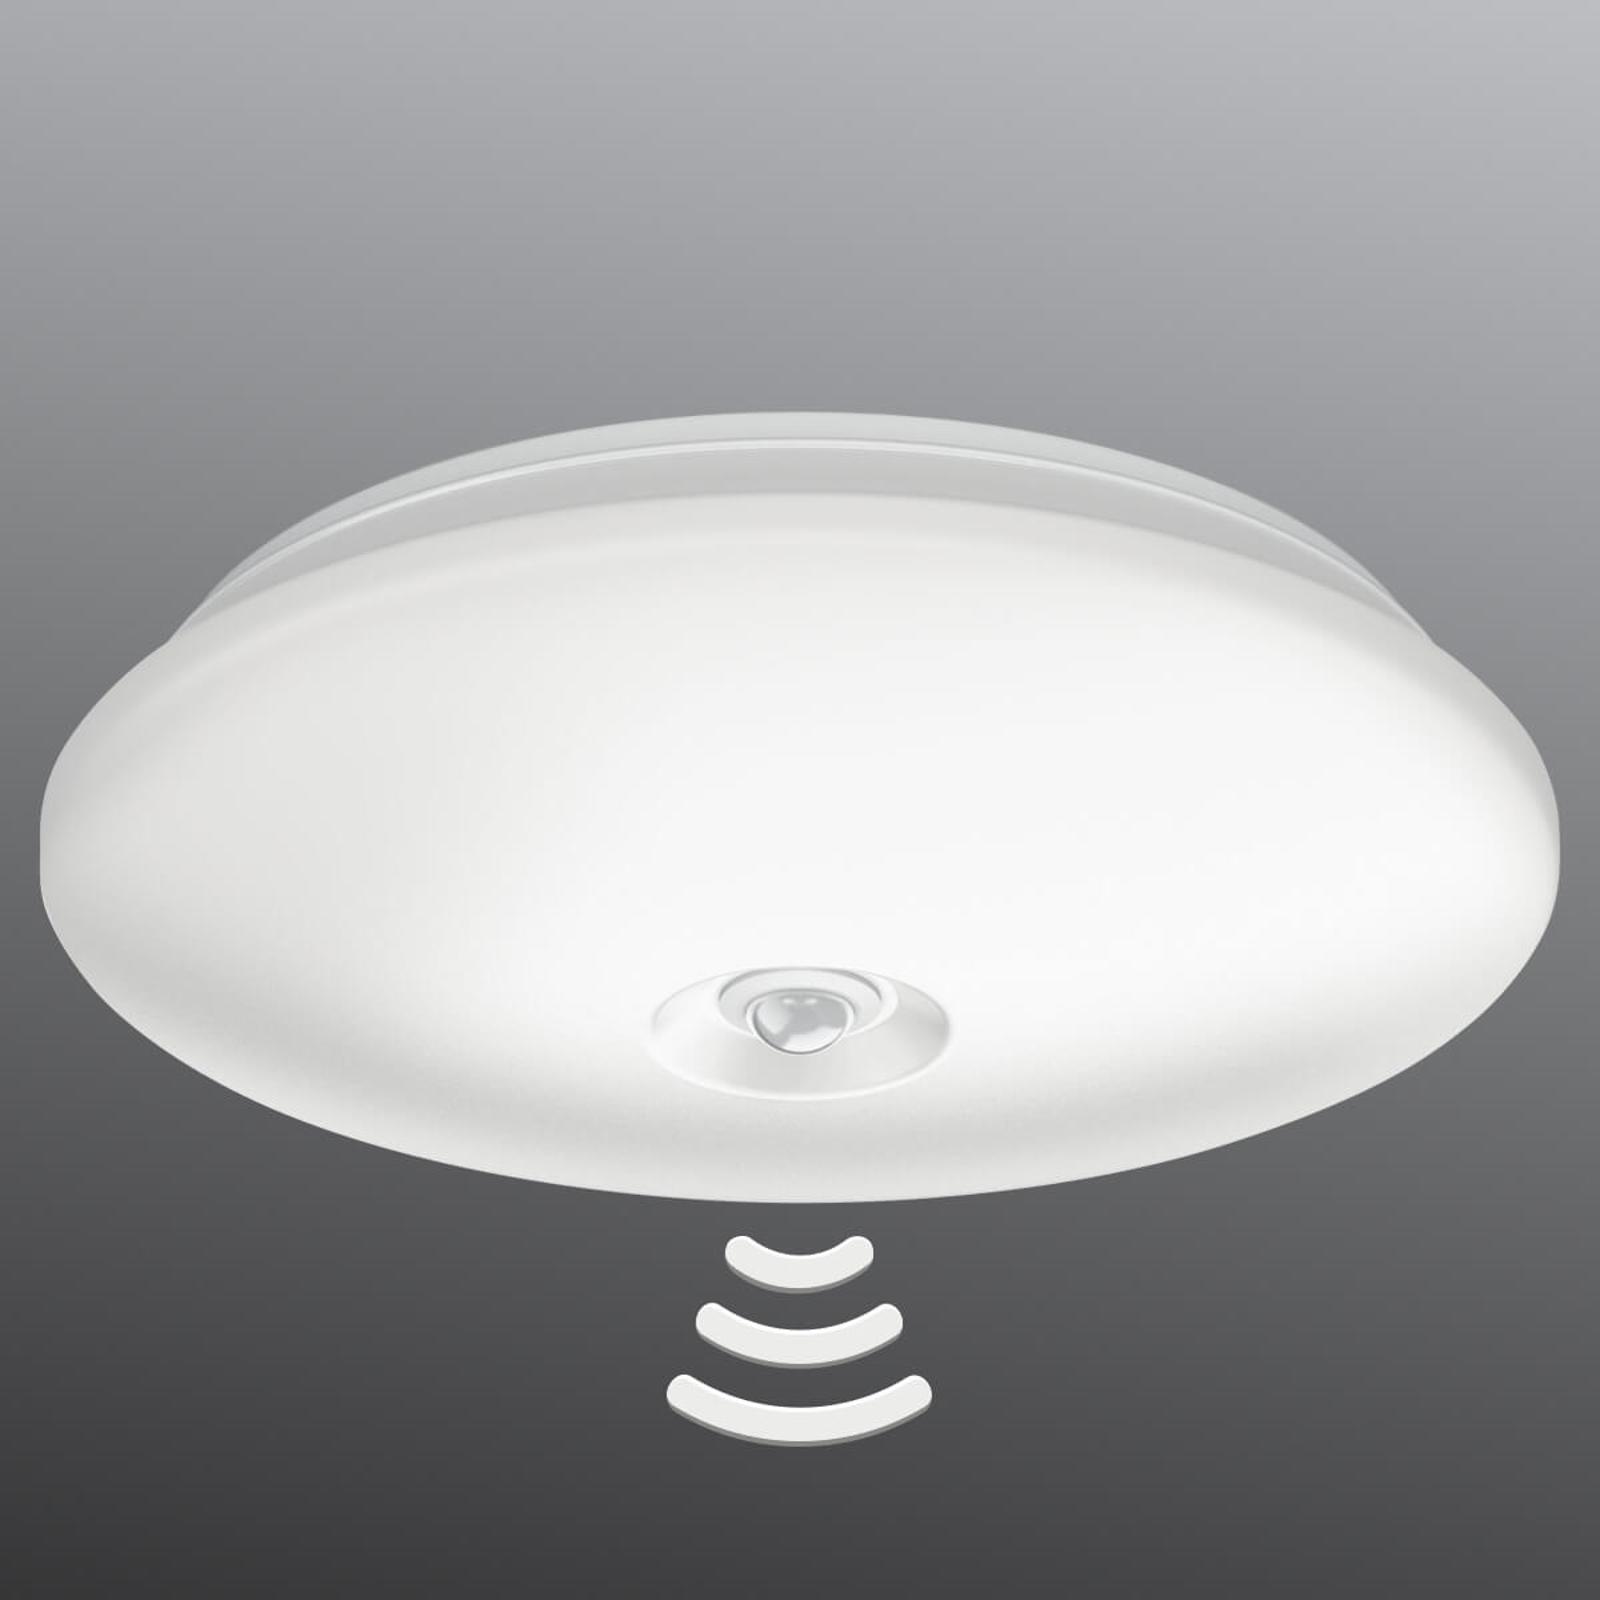 LED-kattovalaisin Mauve infrapunatunnistin Ø 32 cm